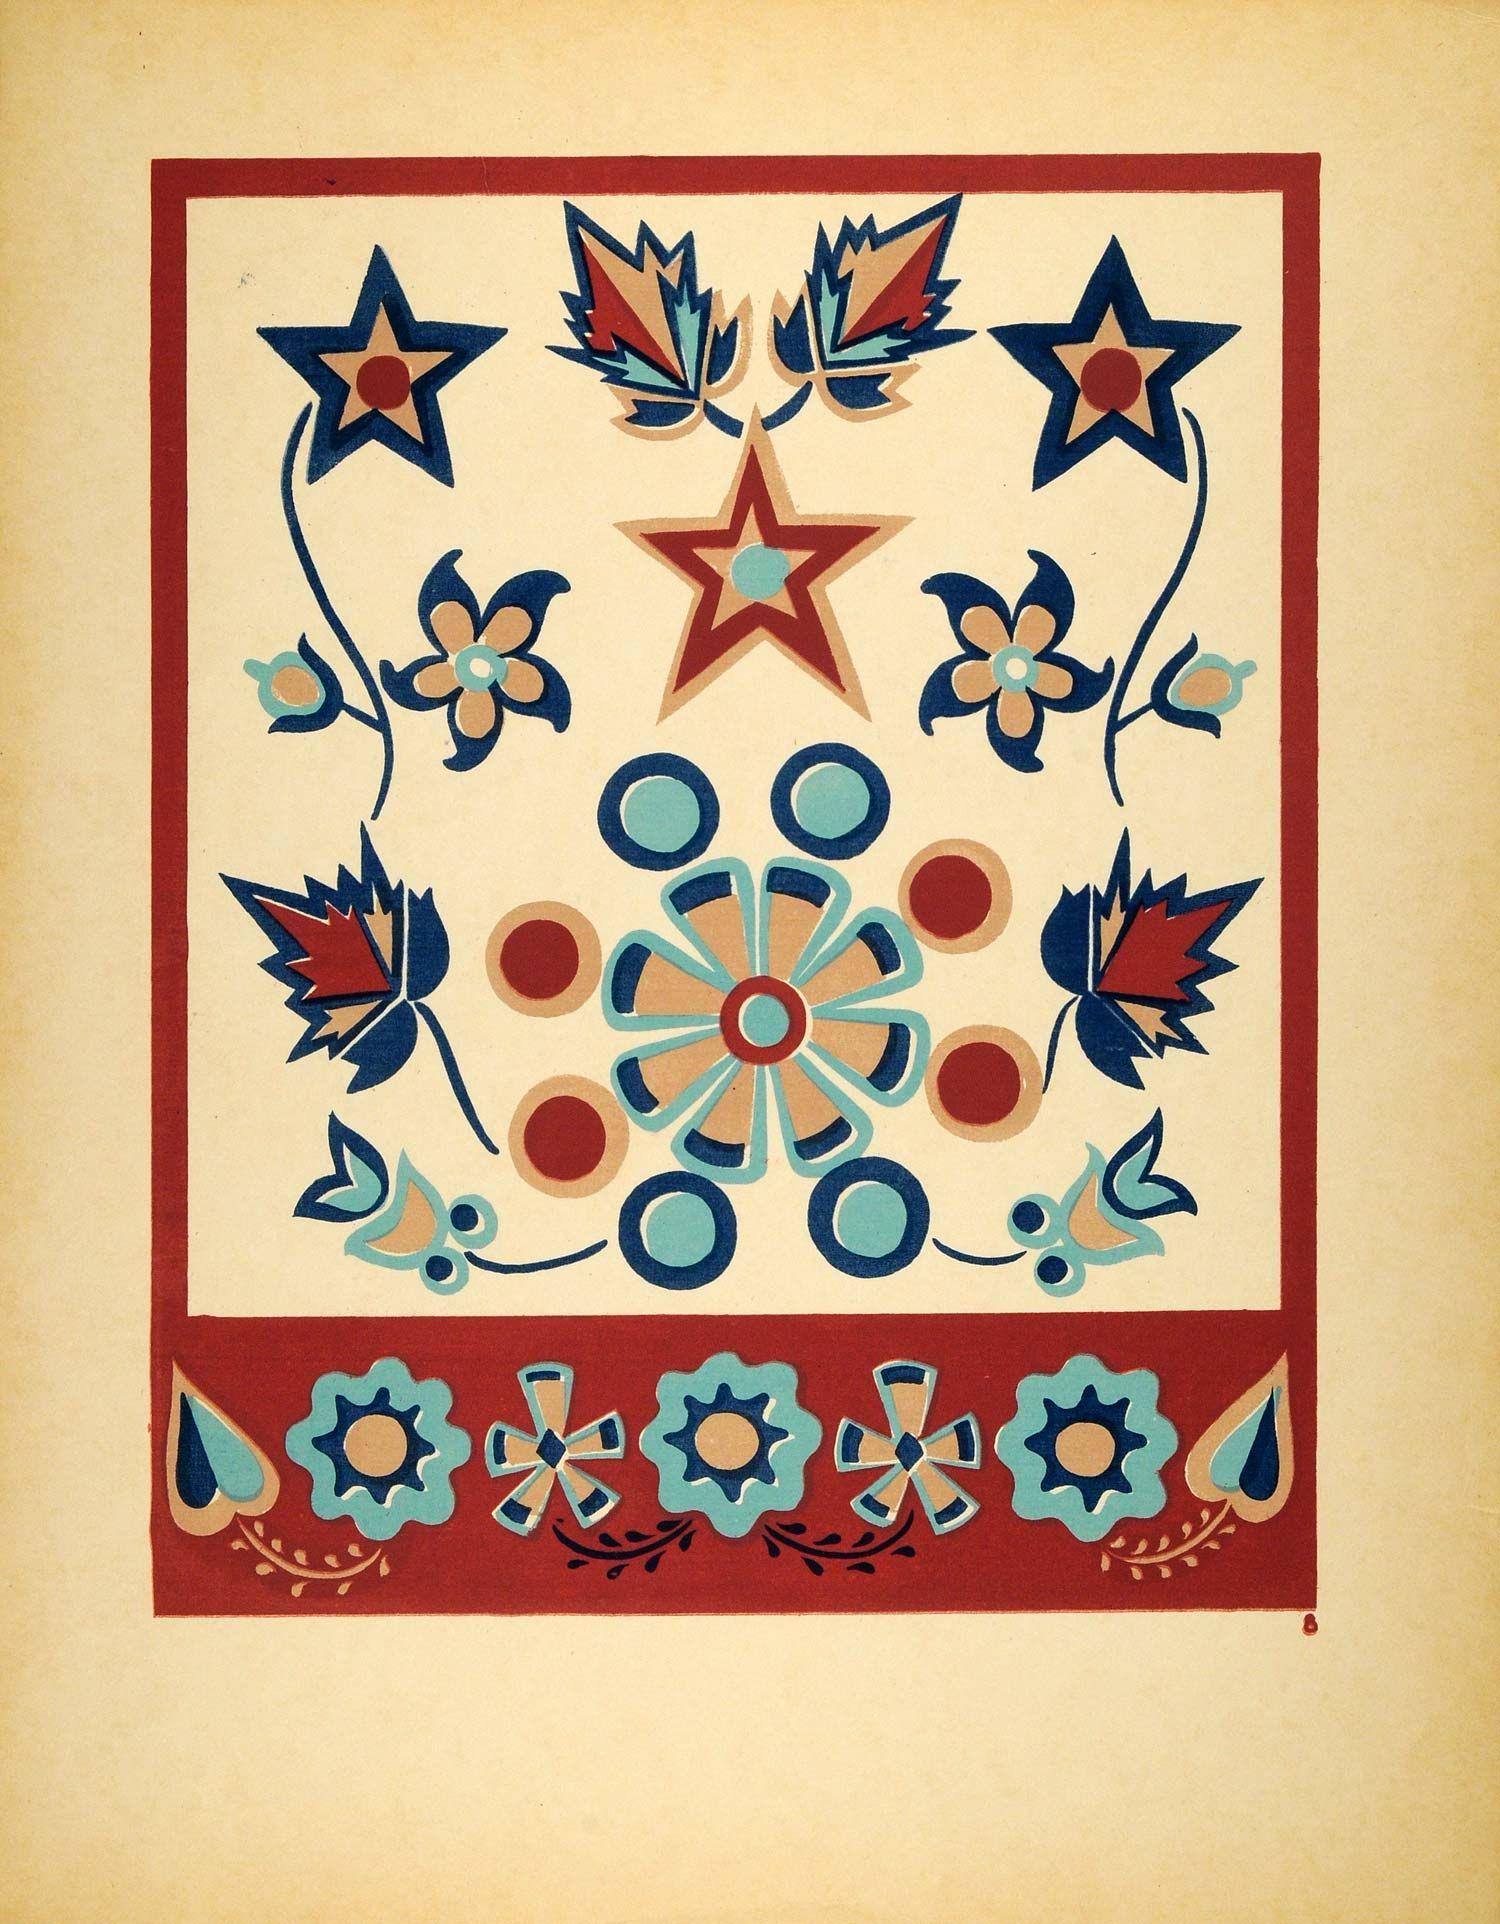 1948 Original Serigraph Menominee Indian Dance Floral Star Design